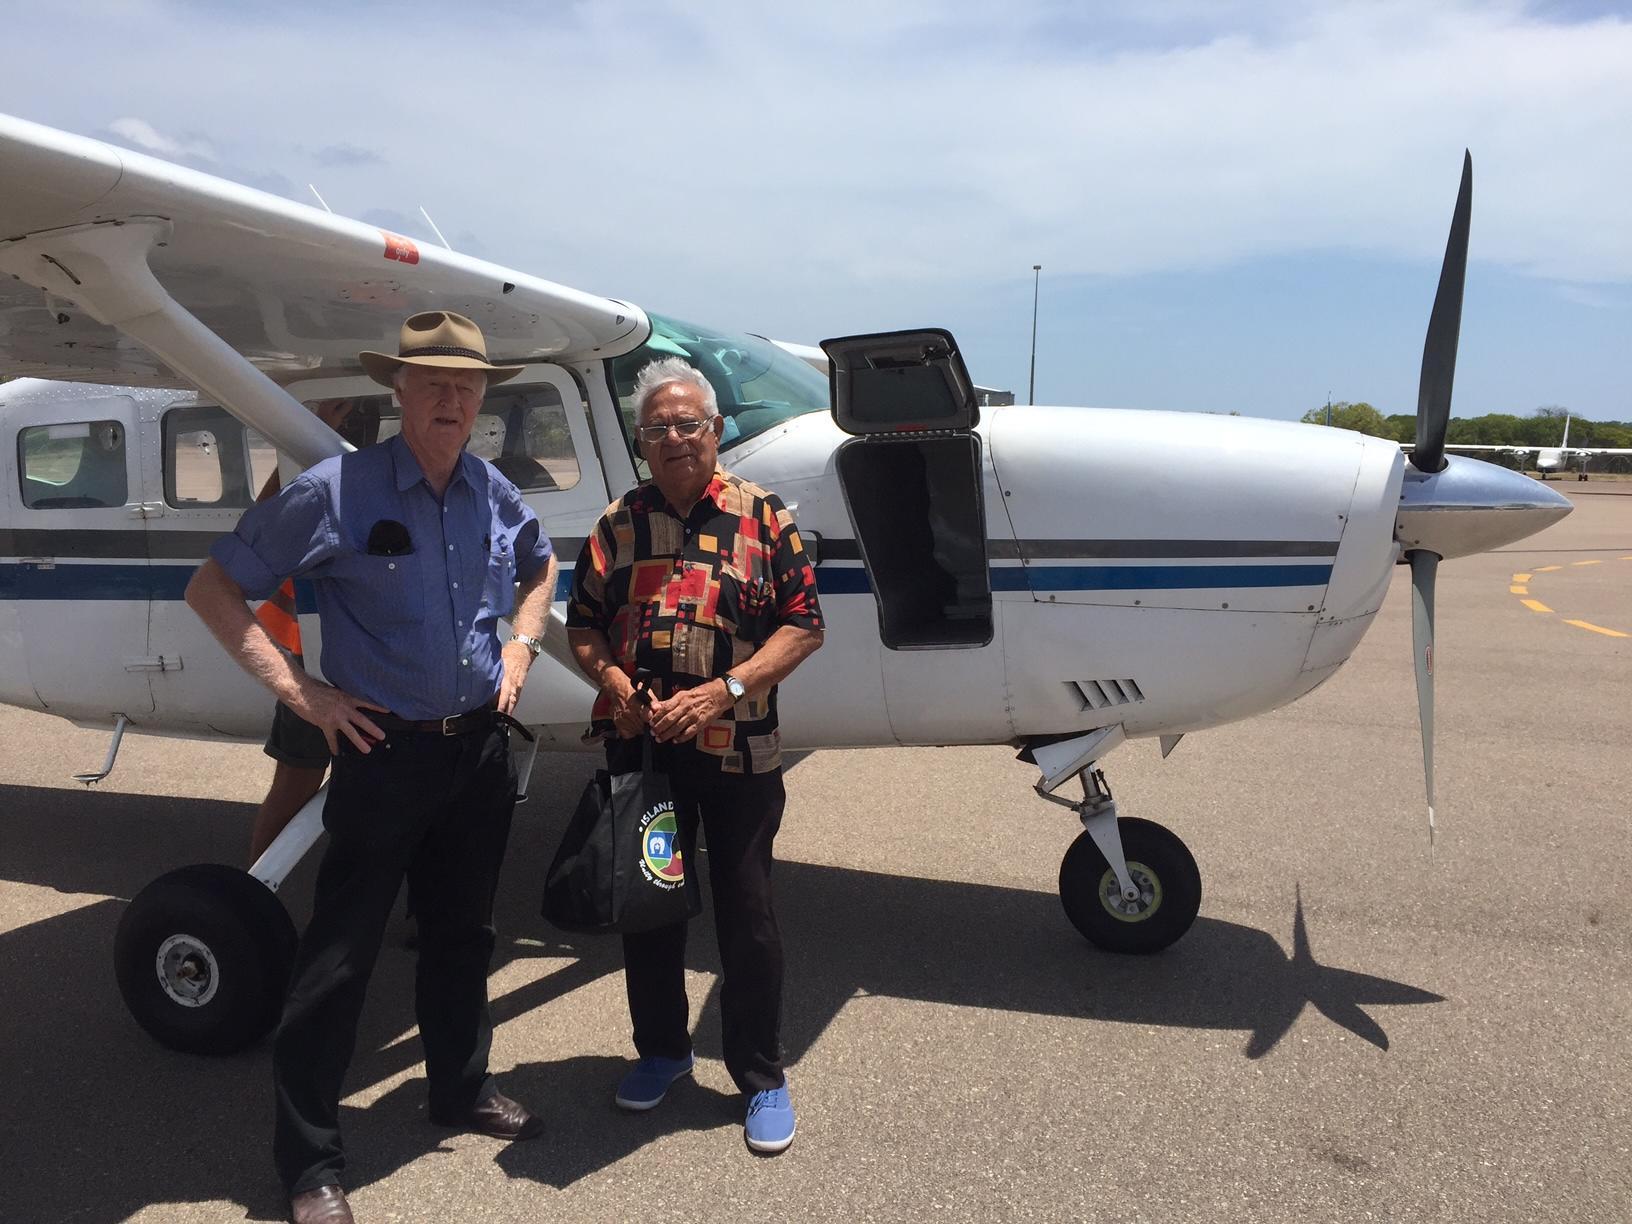 Lindsay McDowell & Rodney Rivers (Kimberley Elder). 19 years of travelling to all Aboriginal & Torres Strait Islander communities.